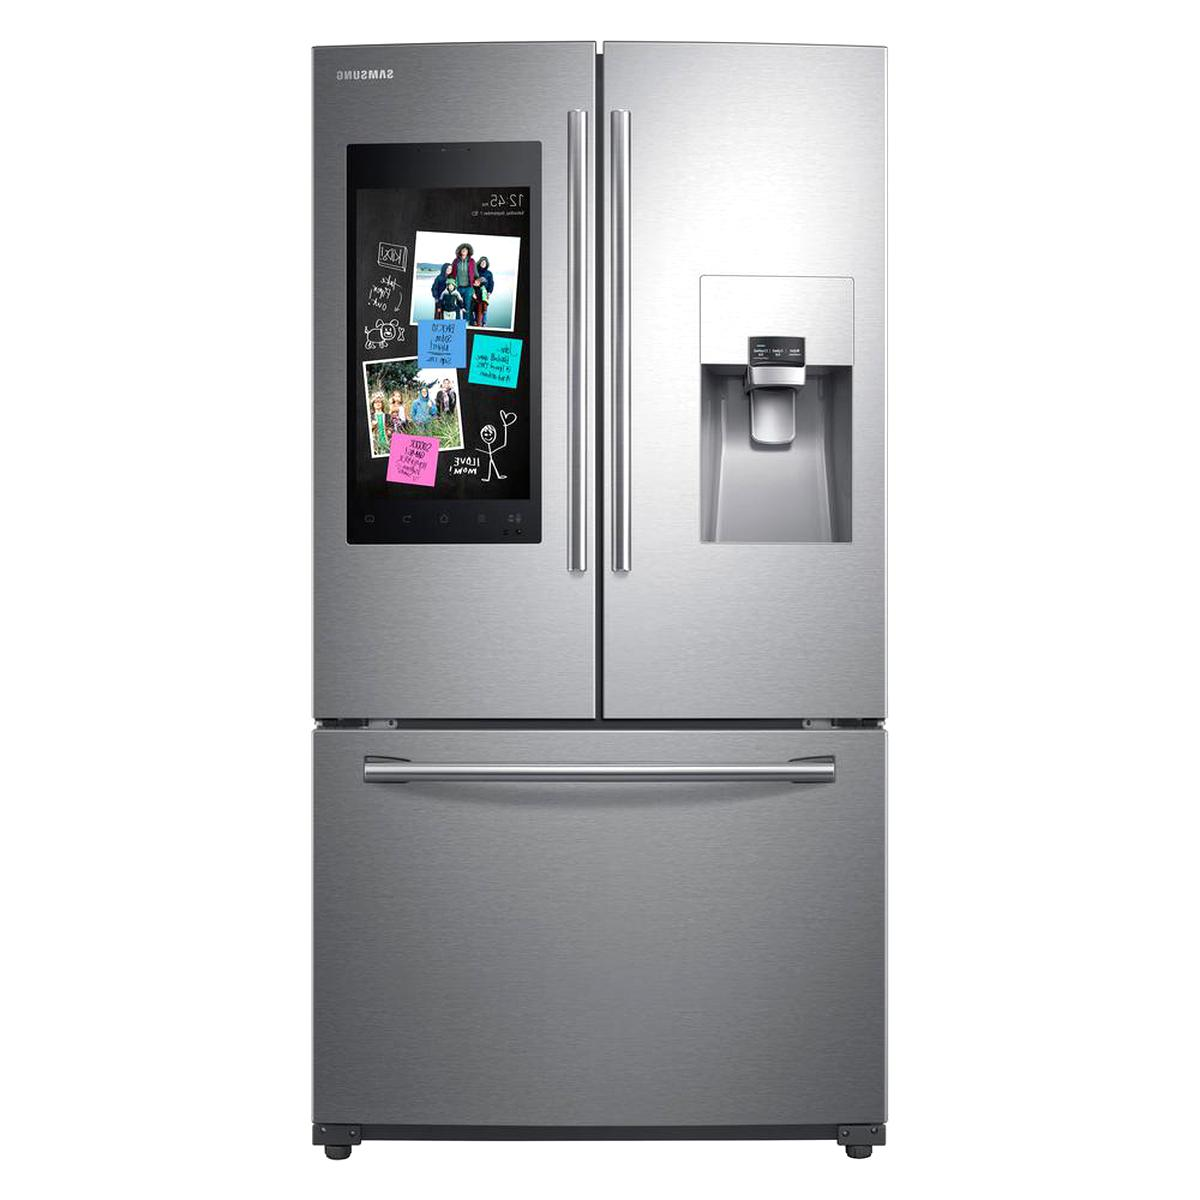 samsung refrigerator for sale